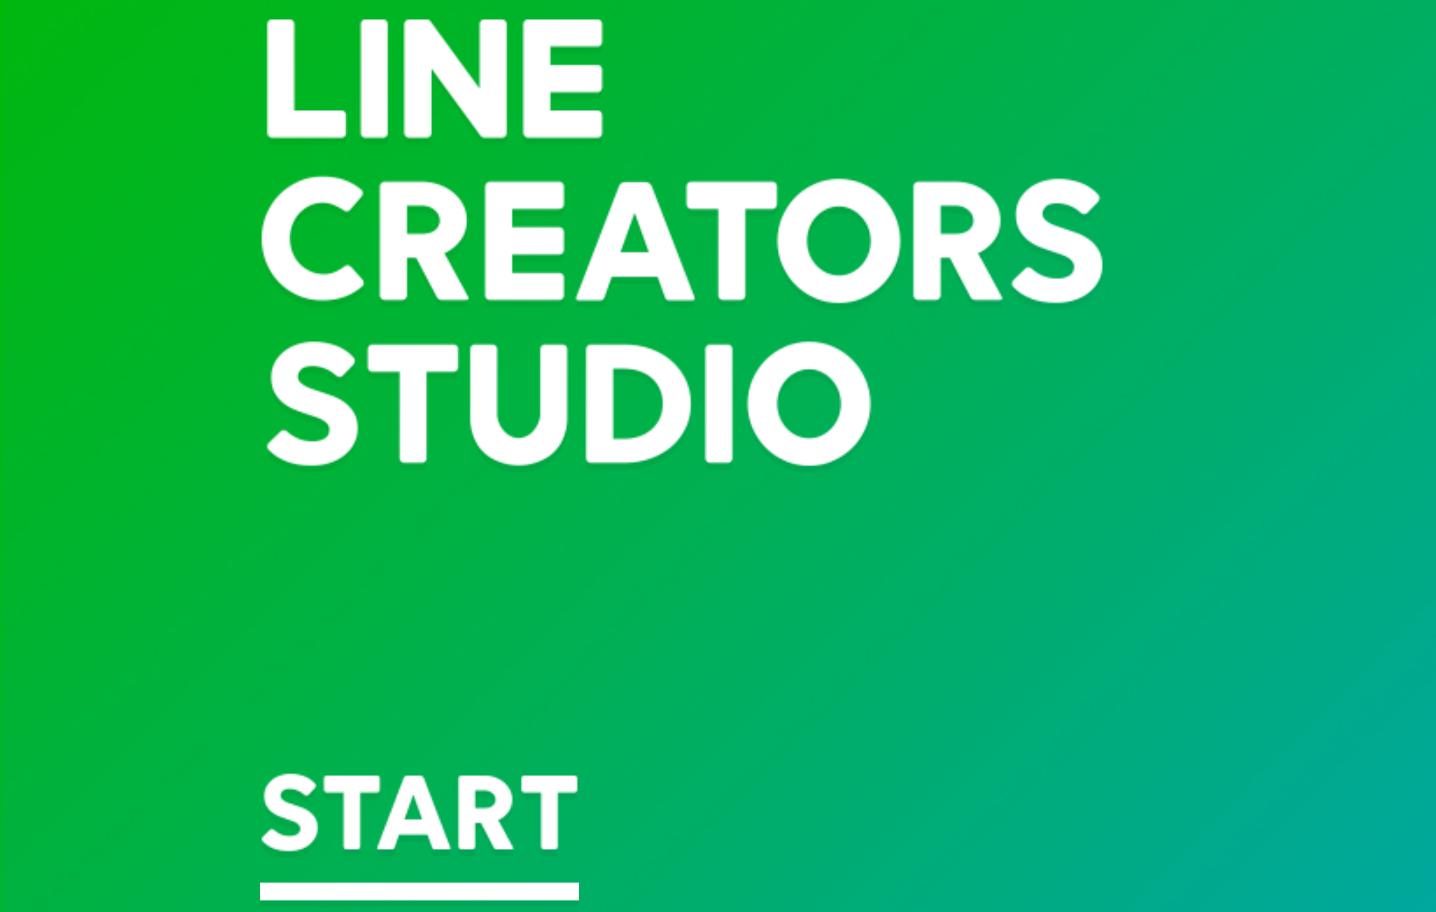 app 教學 | 自製 Line 貼圖 Creators Studio 聊天拍貼 DIY